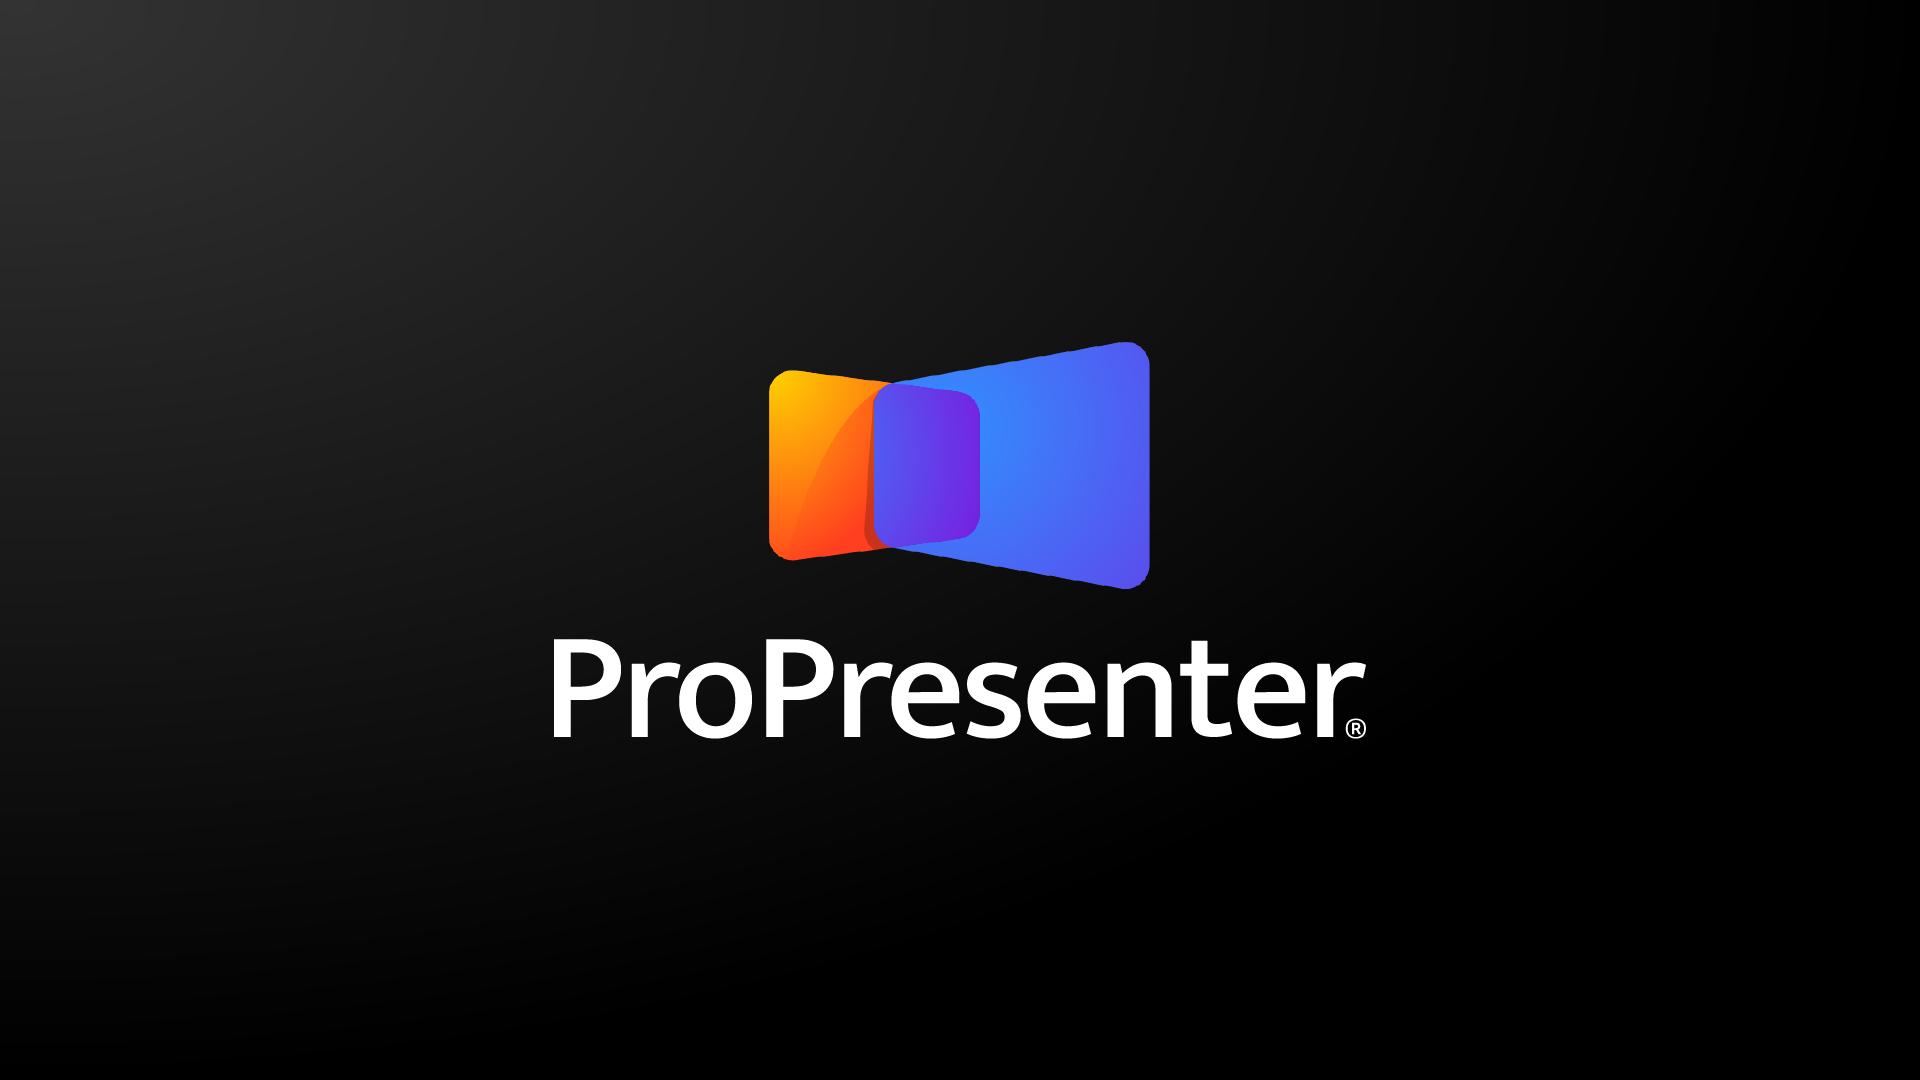 ProPresenter 7 Campus License (20 Seat) by Renewed Vision